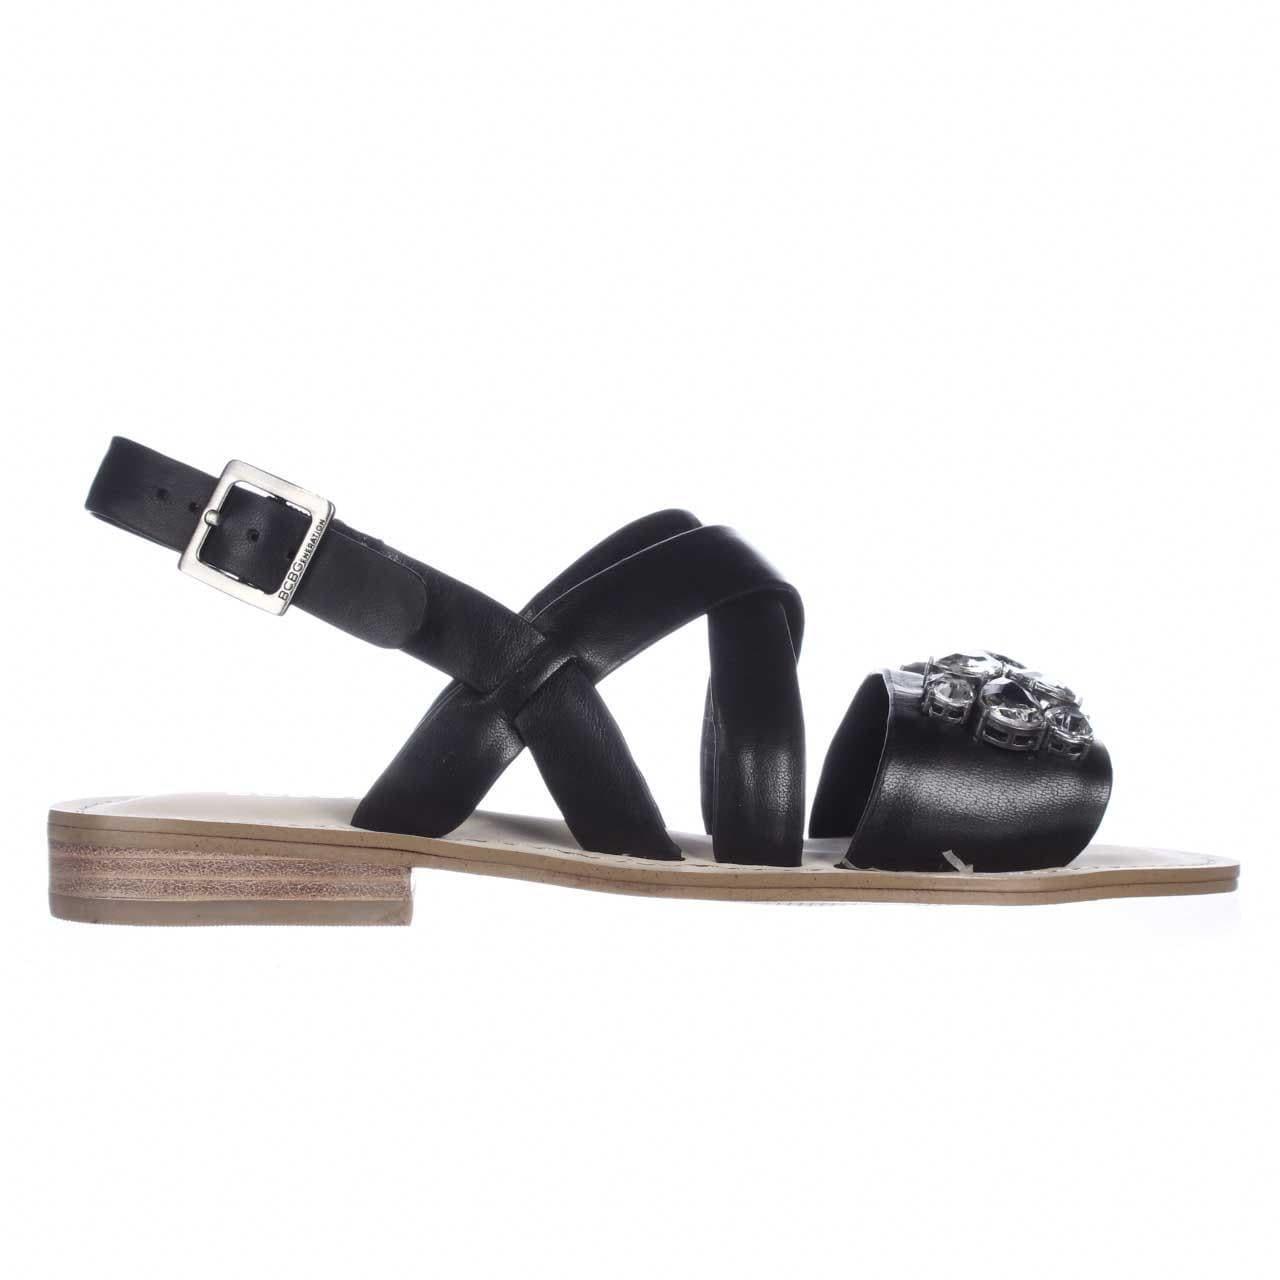 d6c51282ca294 Shop BCBGeneration Remmy Jeweled Flat Sandals